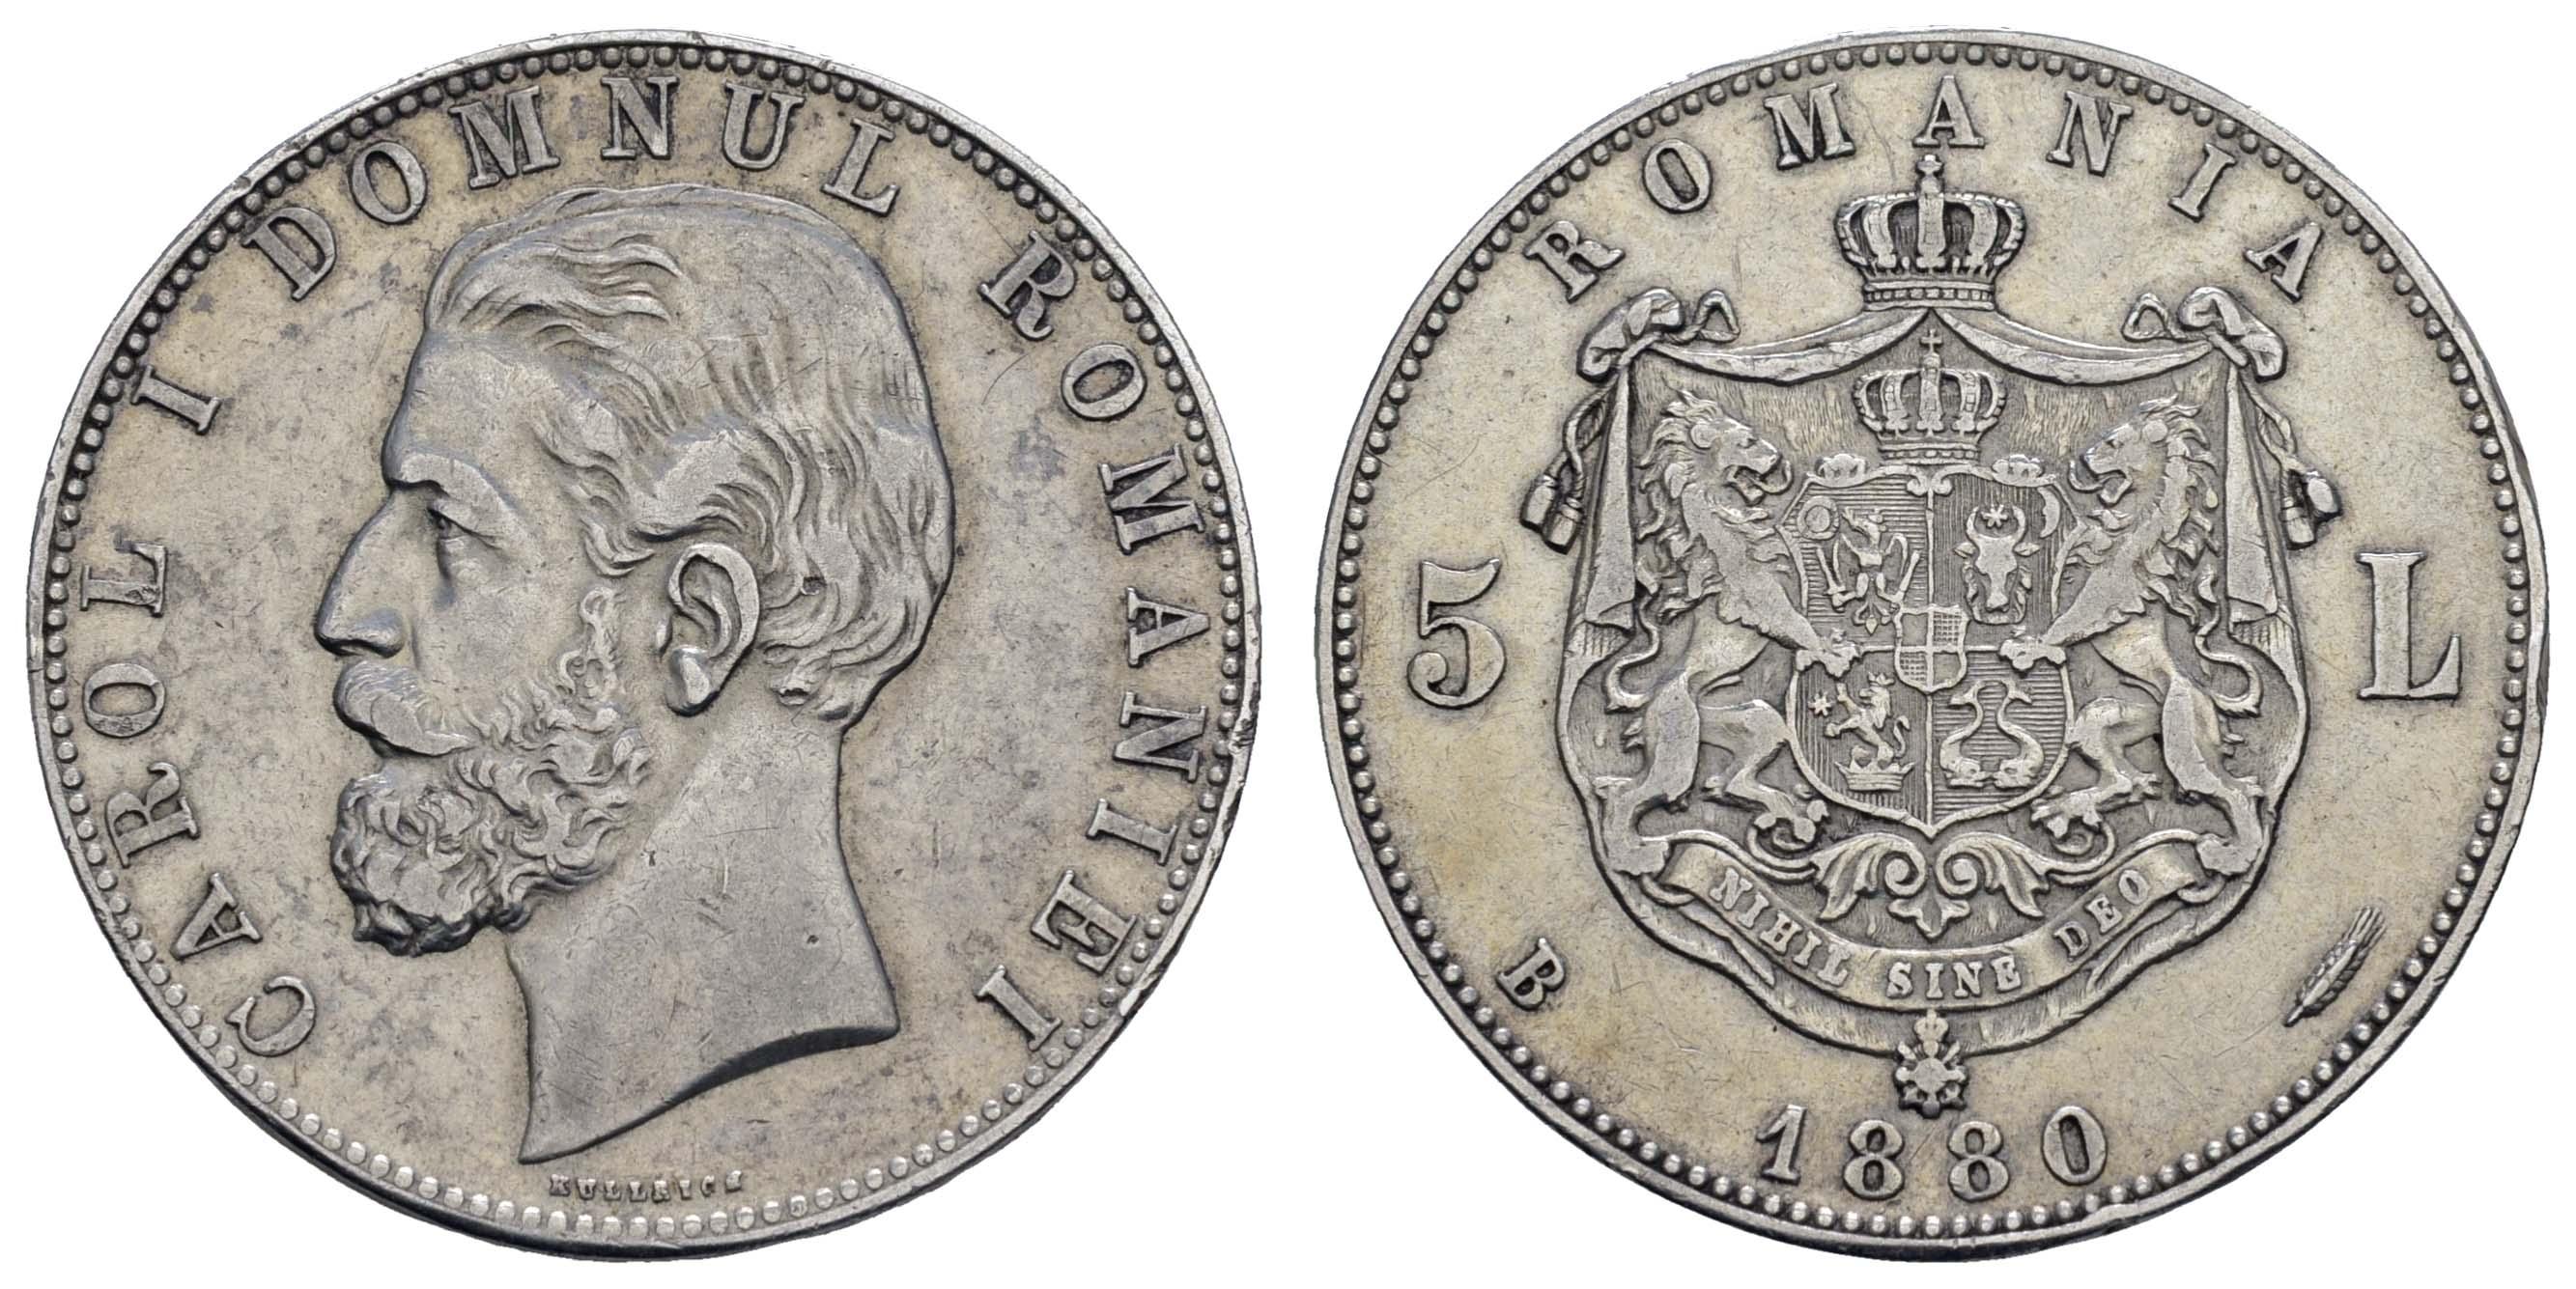 Lot 1727 - europa ab 1800 - Rumänien -  Auktionshaus Ulrich Felzmann GmbH & Co. KG Coins single lots